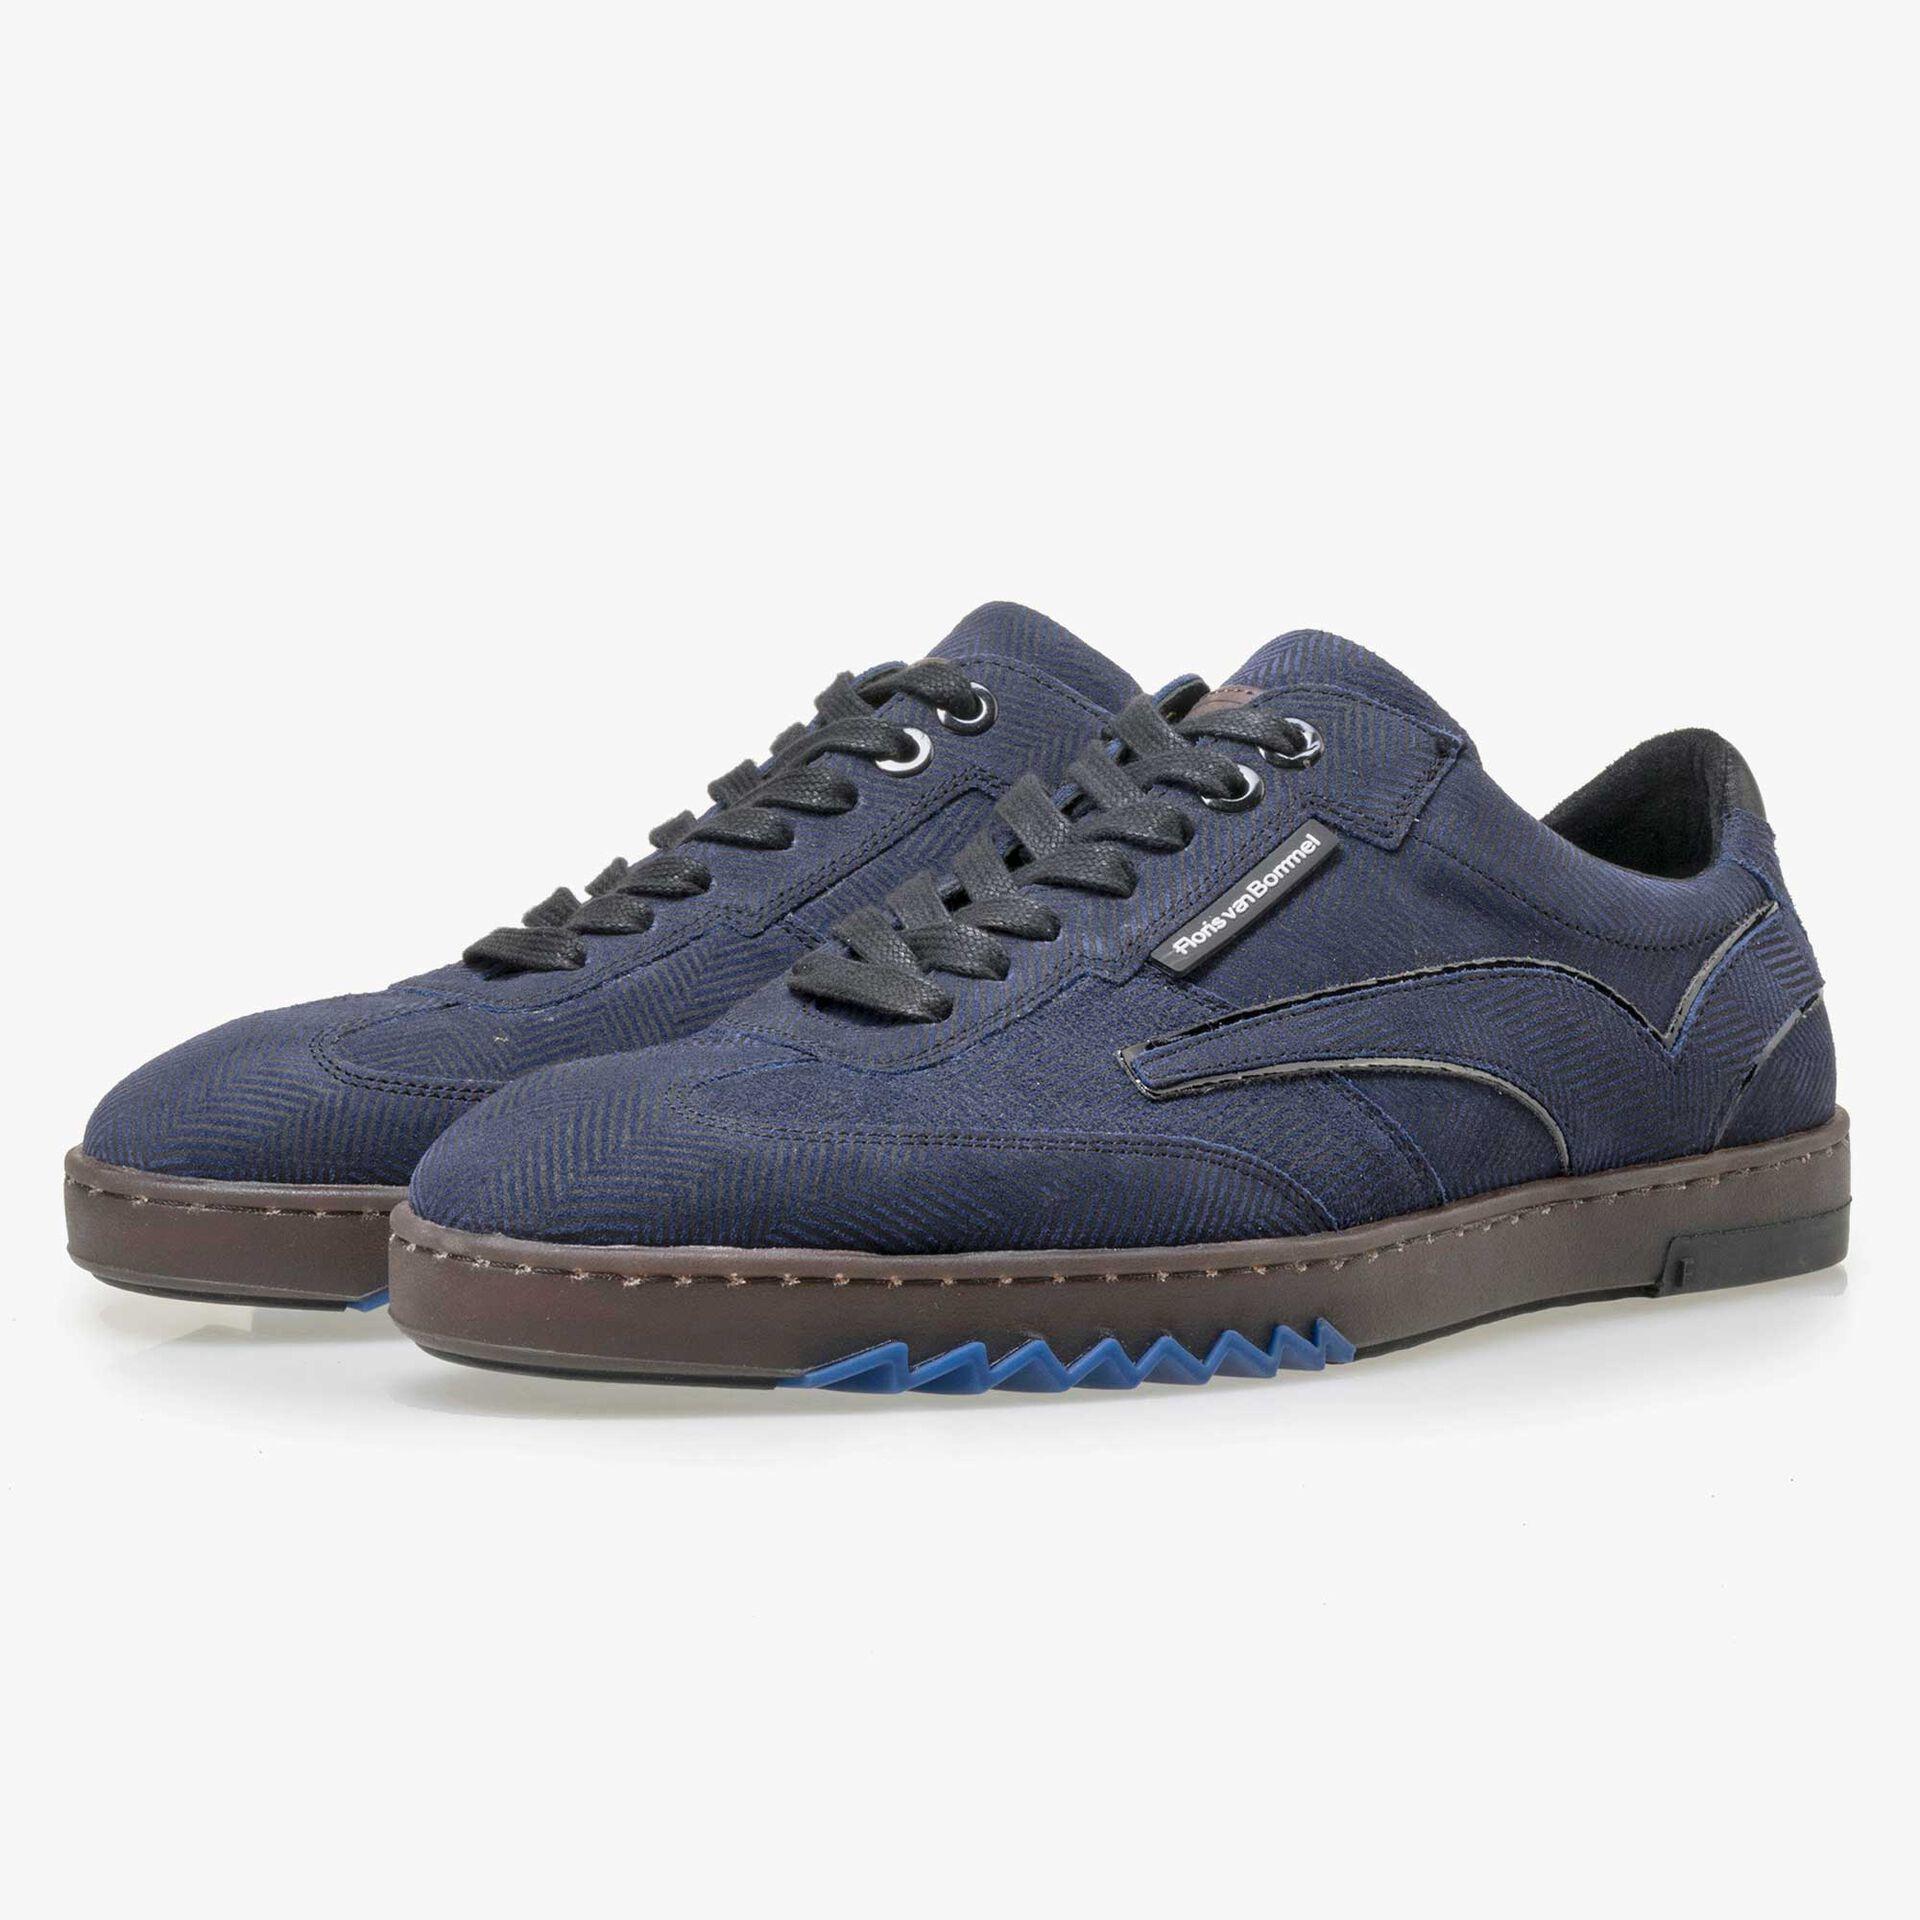 Floris van Bommel blauwe suède heren sneaker met visgraatprint